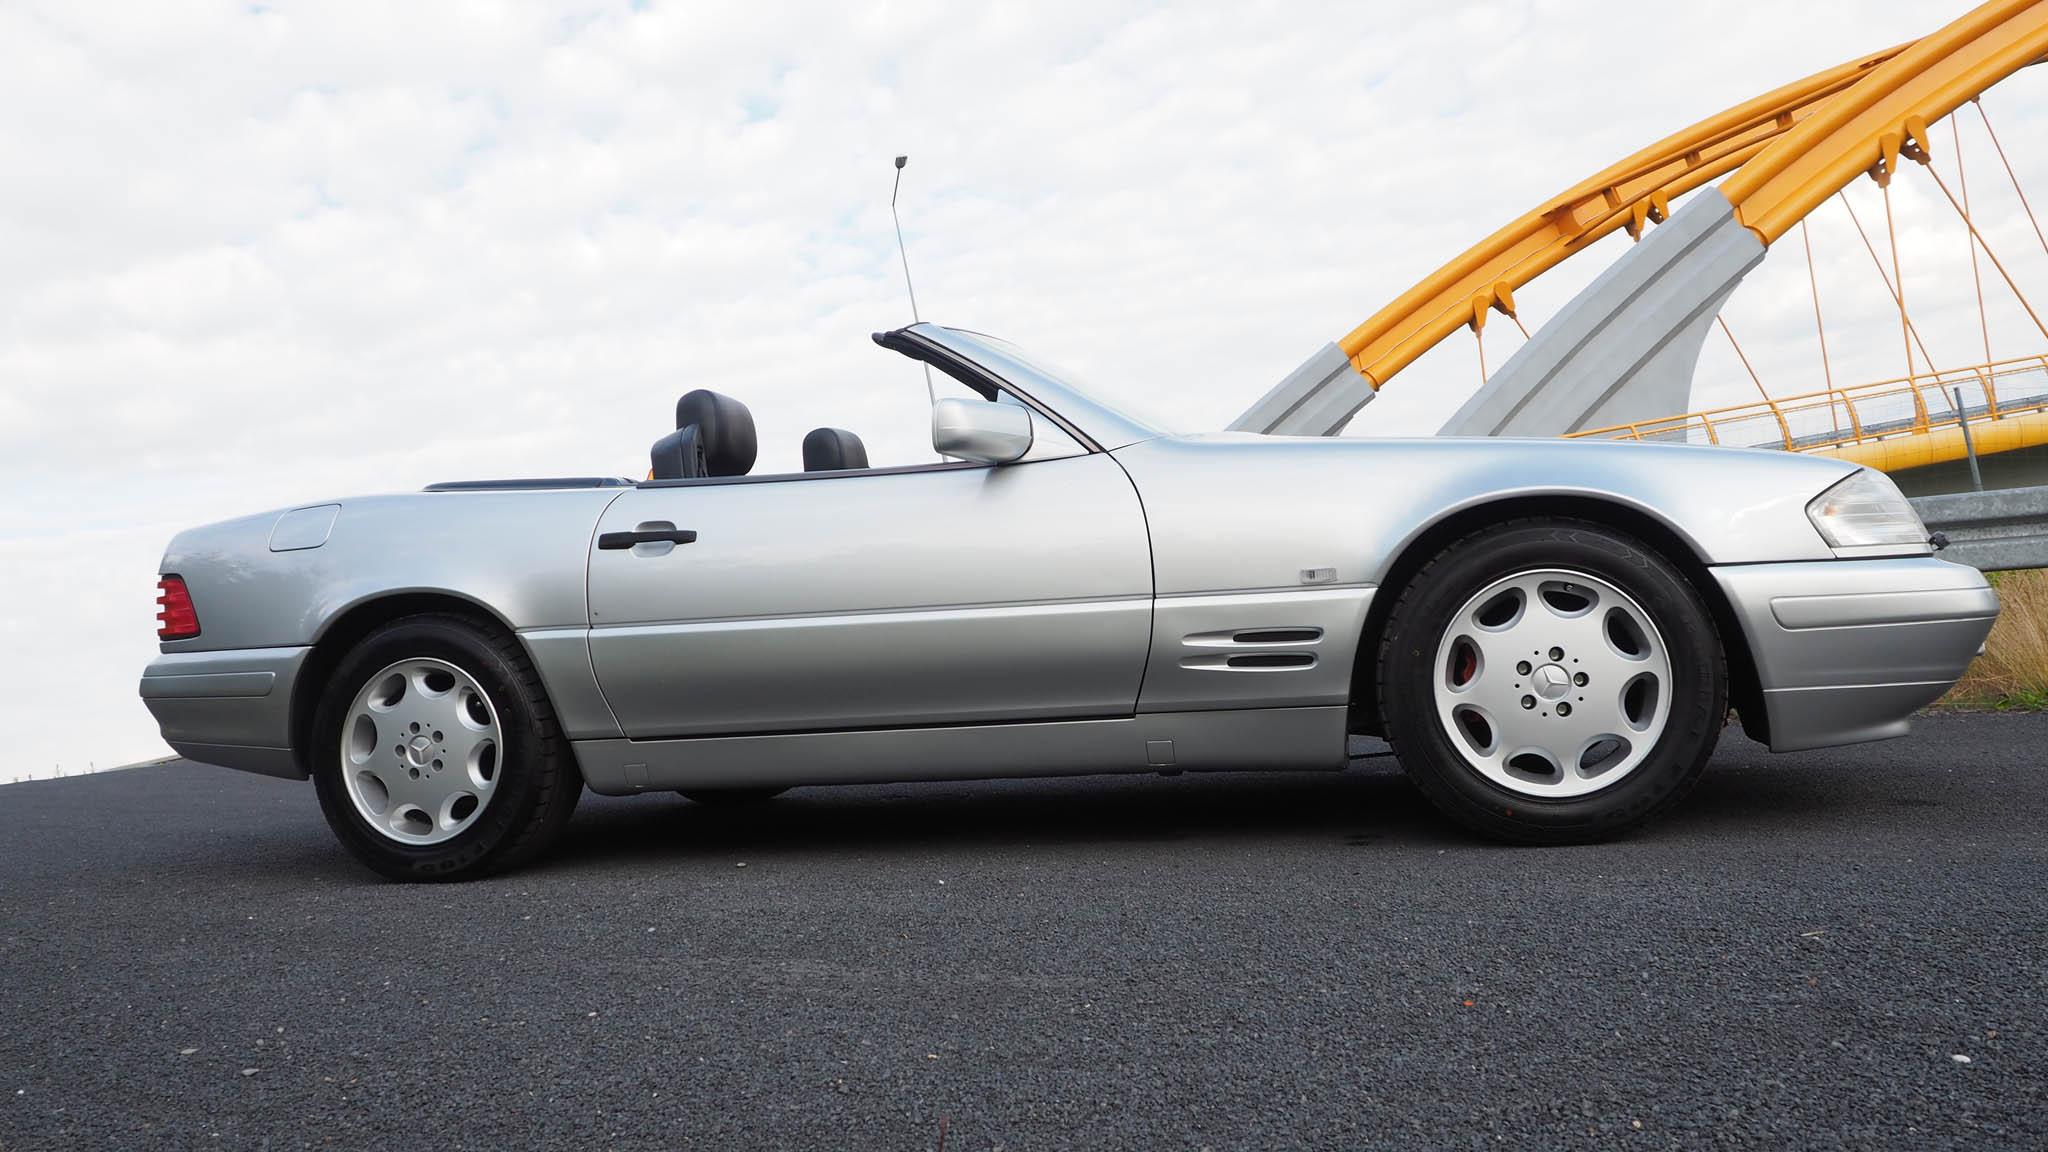 39 97 mercedes benz sl 320 nowex cars for 97 mercedes benz